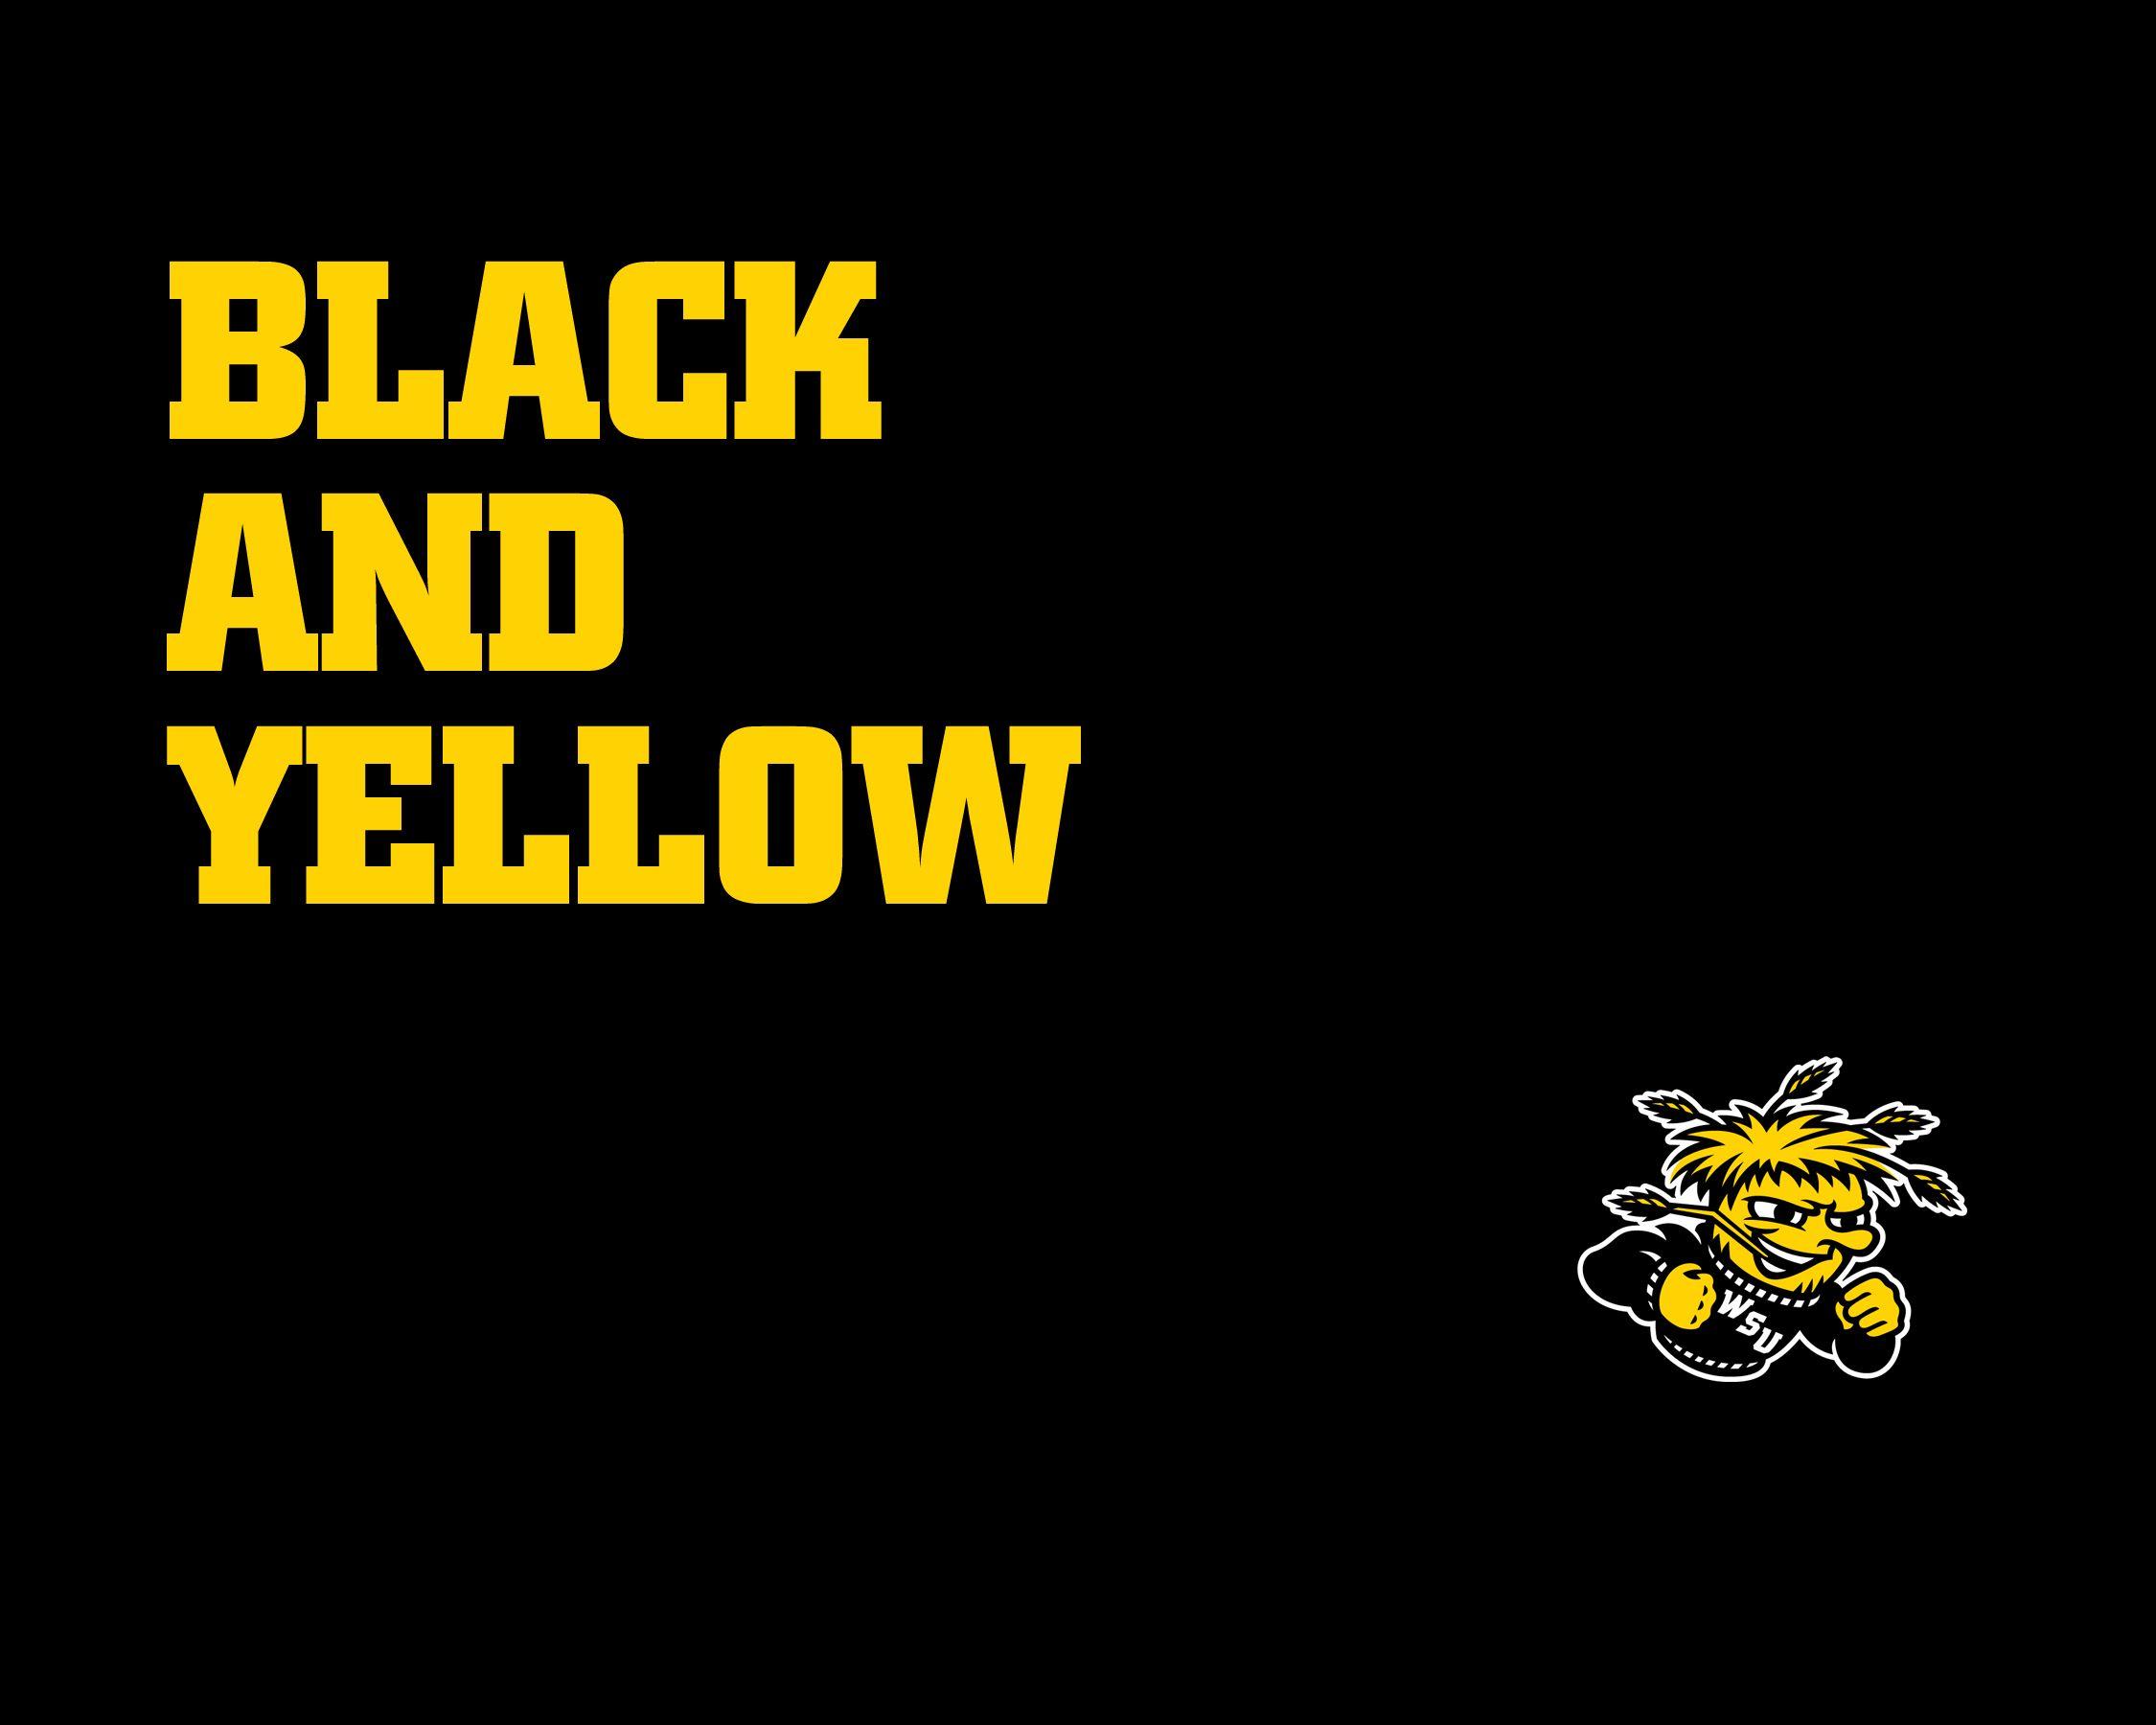 Black And Yellow Wsu Shockers Accessories Watchus Black N Yellow Wsu Shockers Yellow Quotes [ 1800 x 2250 Pixel ]